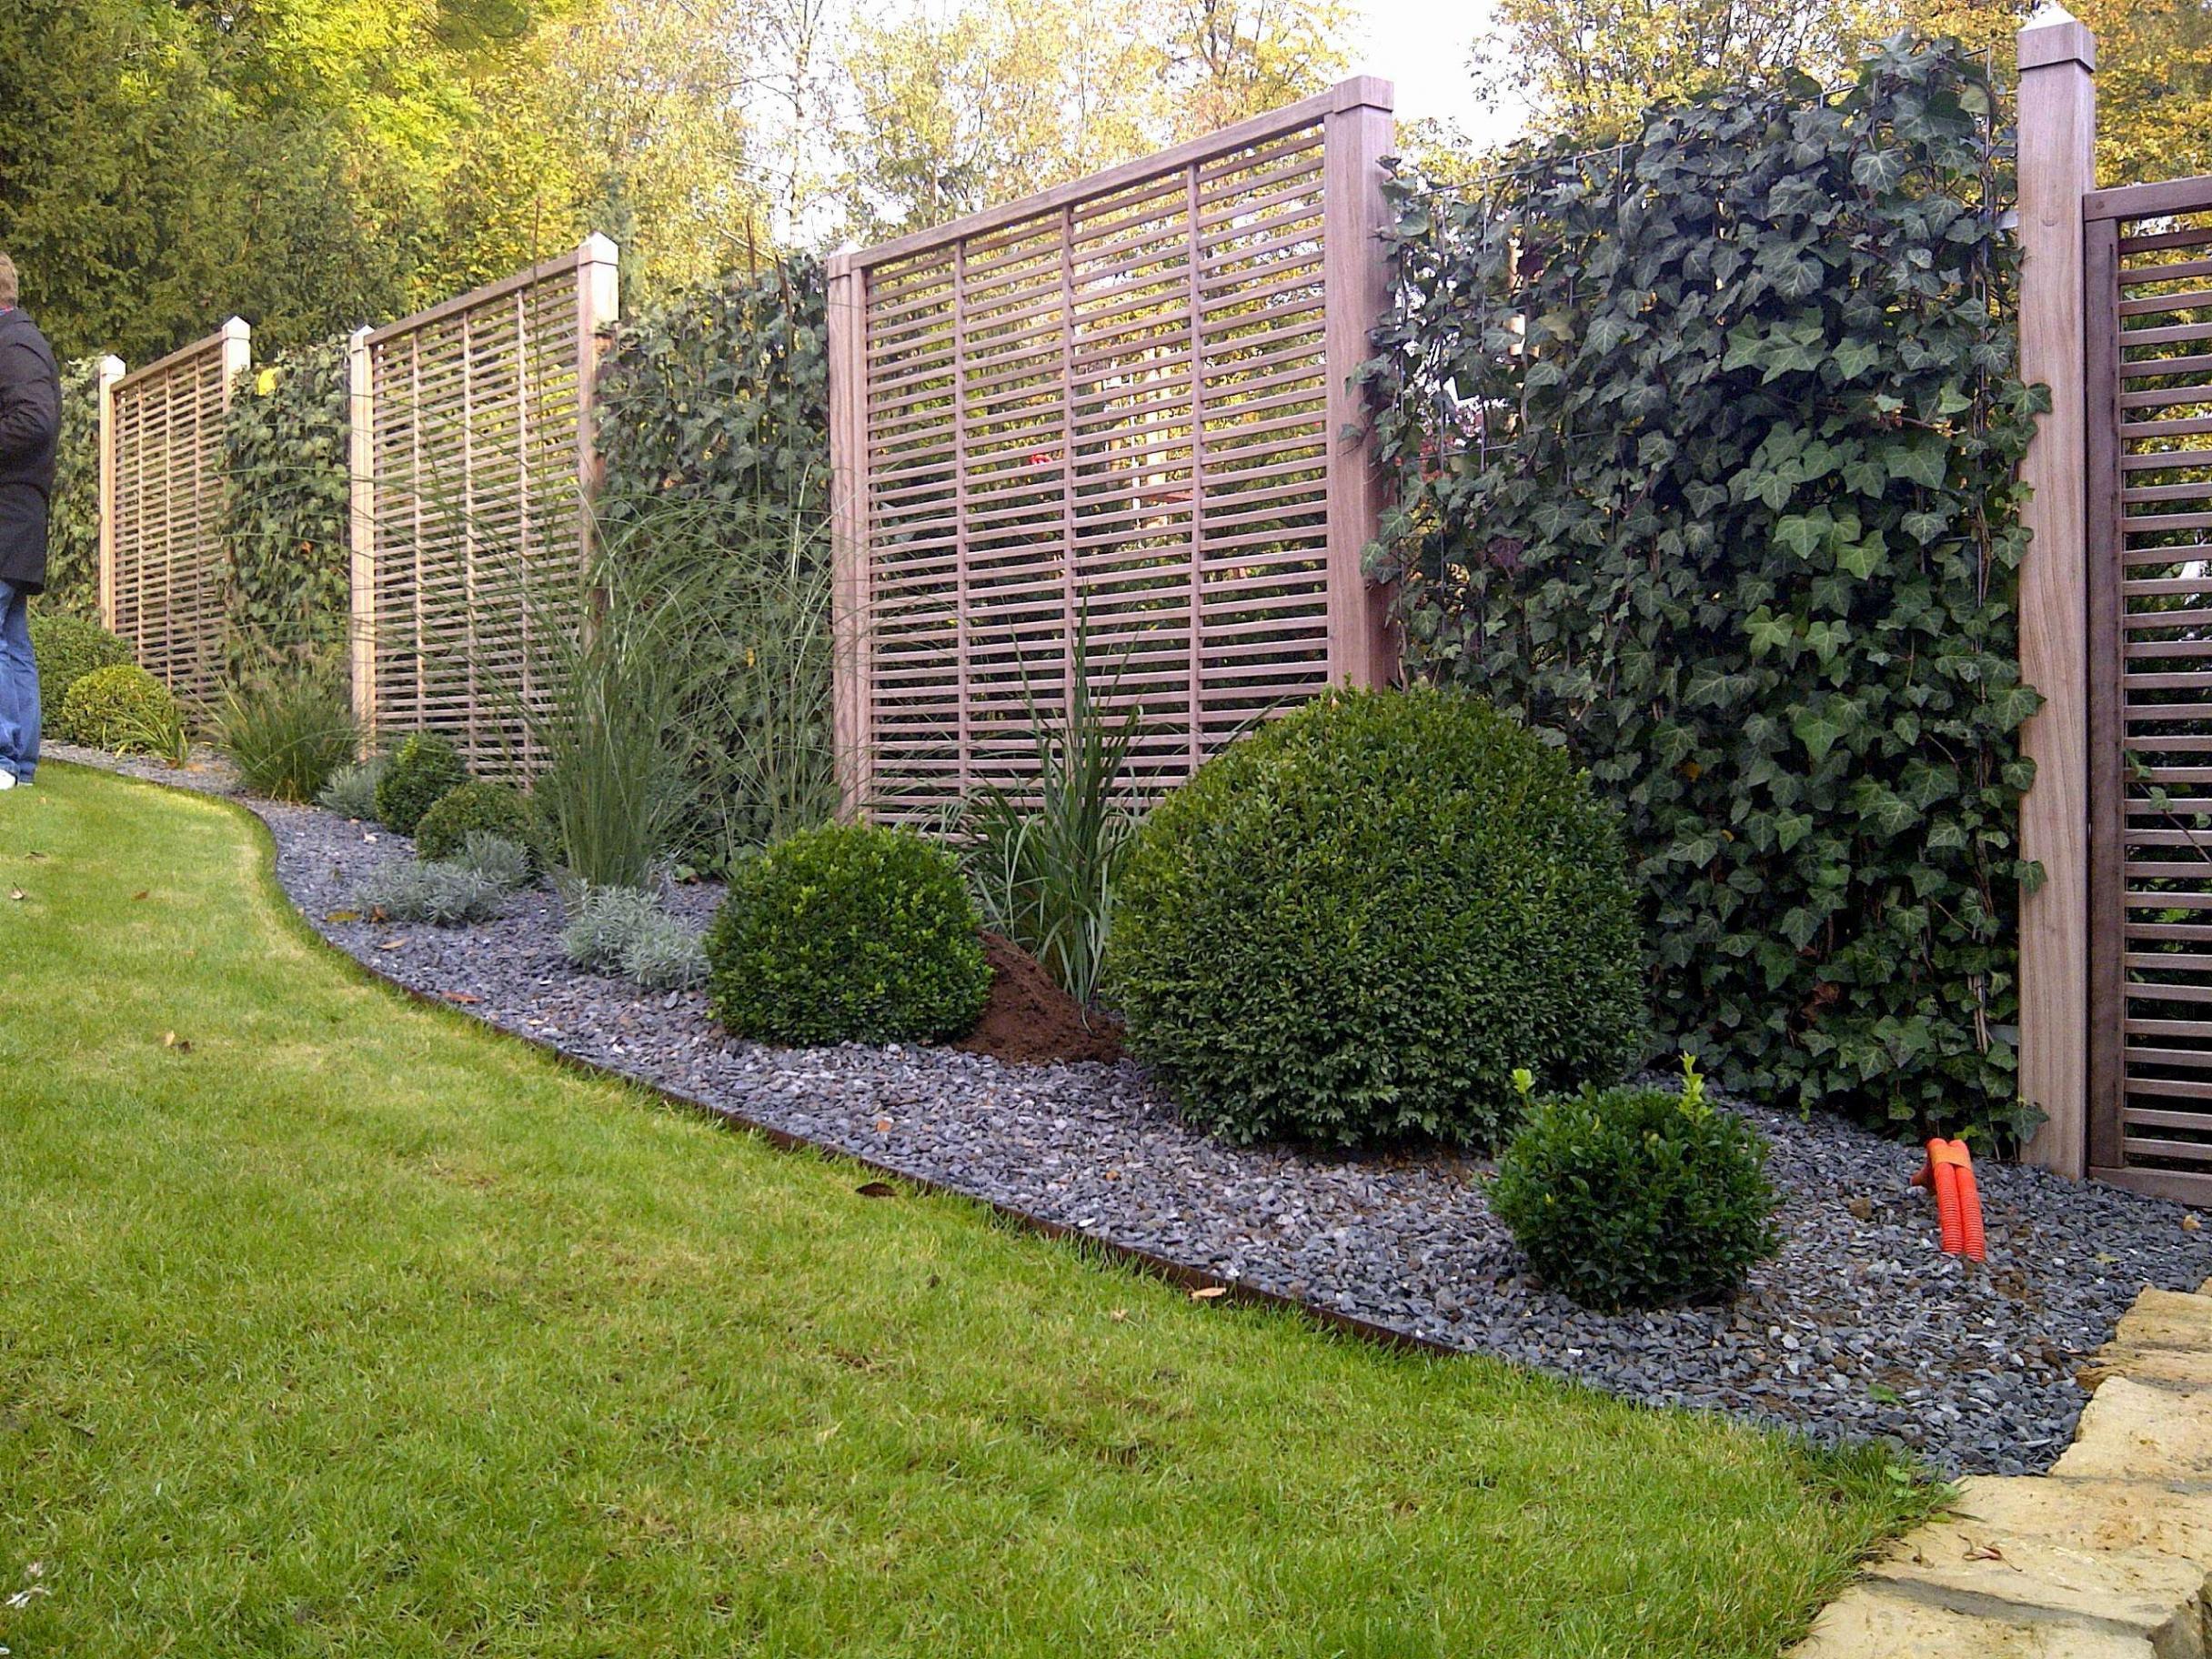 7 Luxus Garten Ideen Sichtschutz  Garten Deko